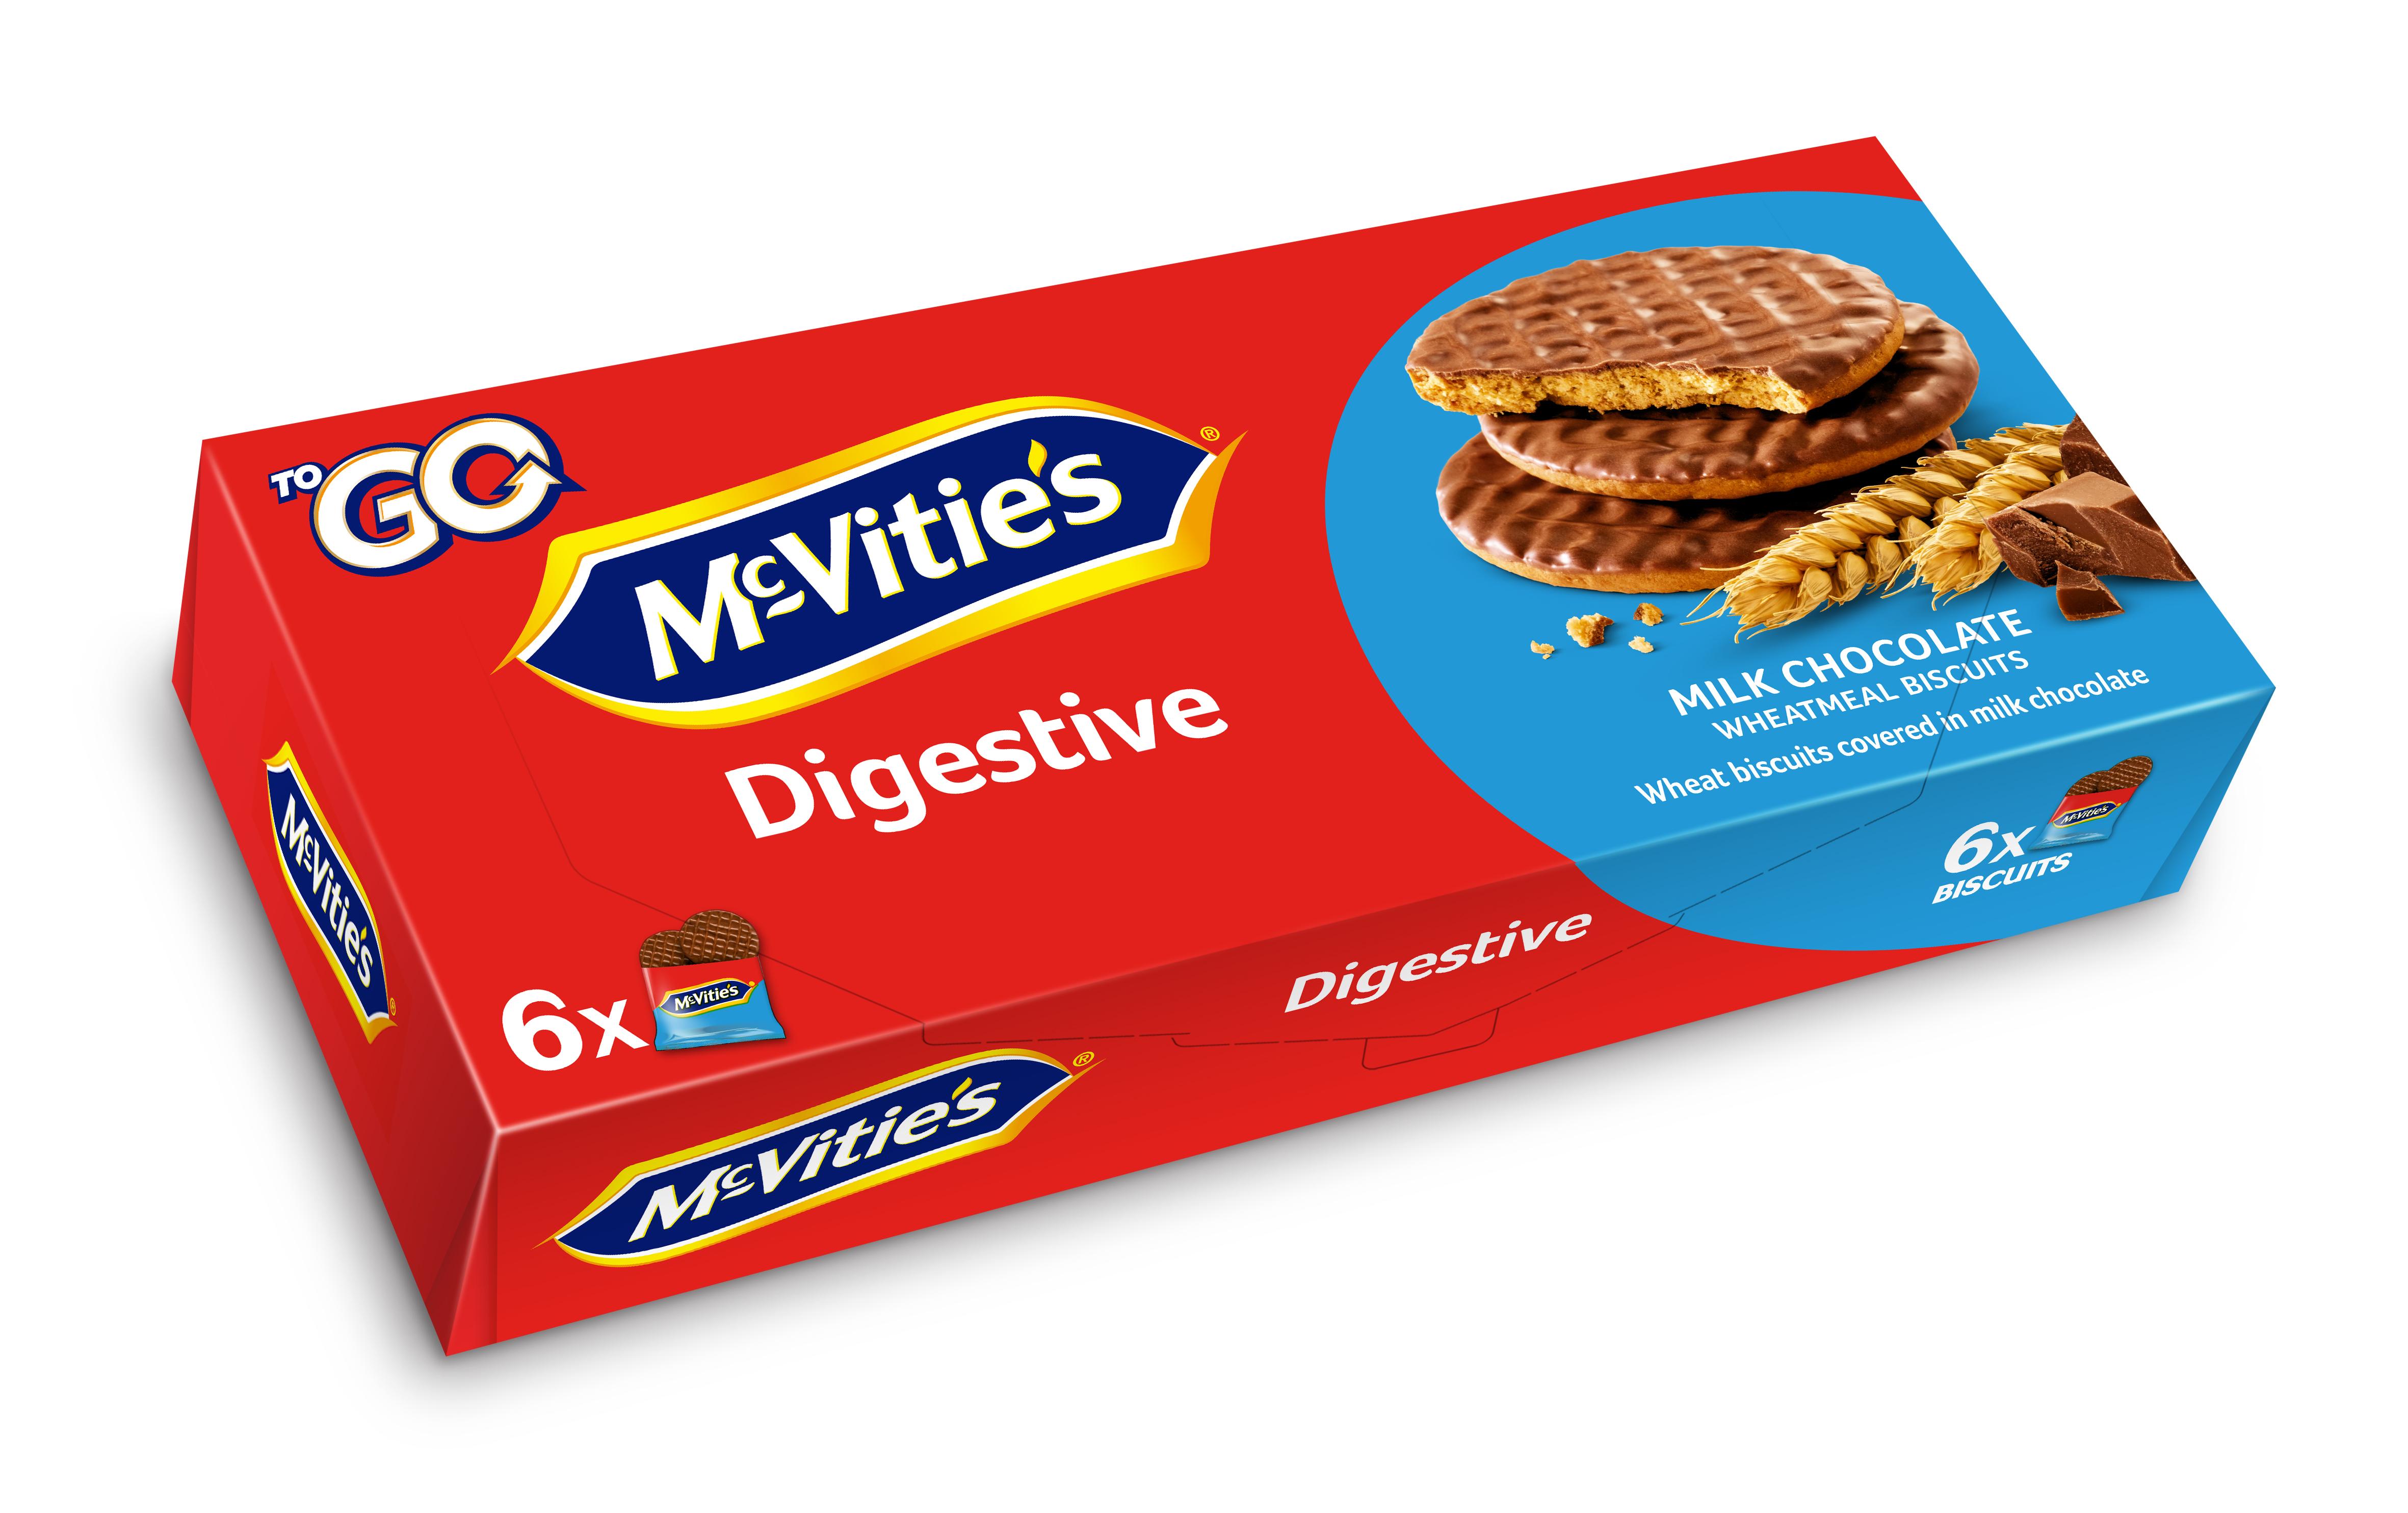 Bolachas Digestivas Go Choc Leite Mcvities 200g